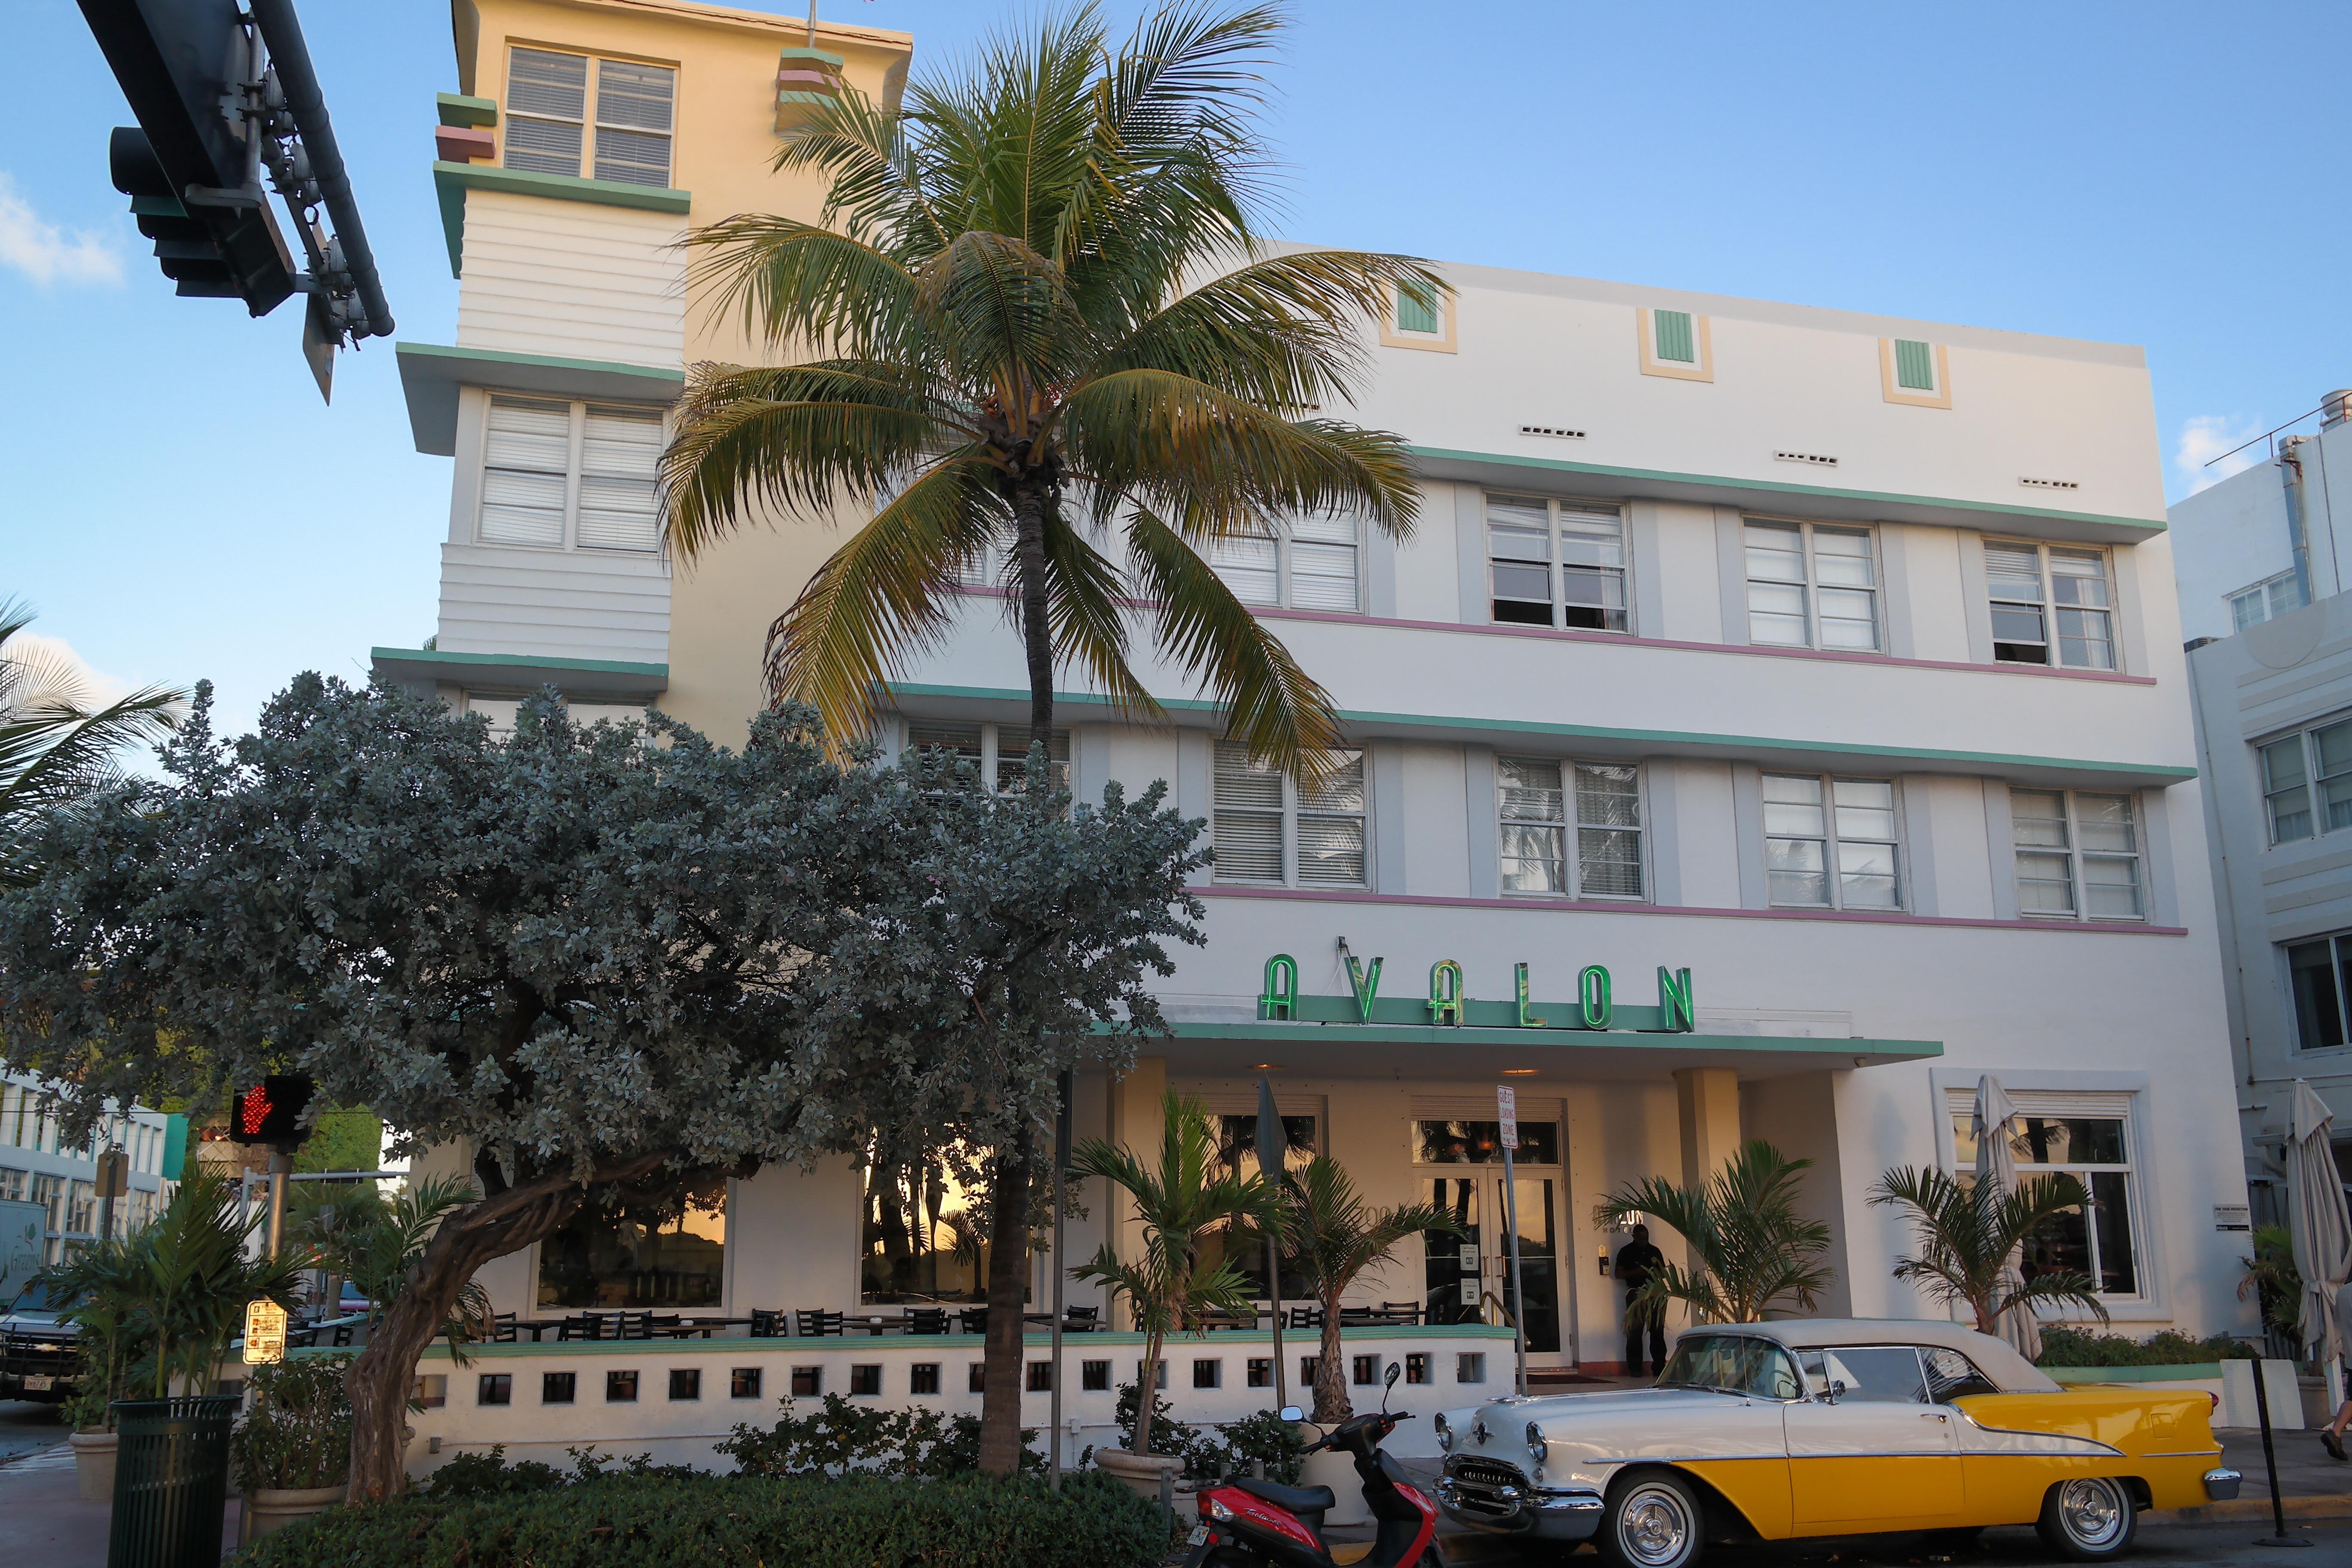 Avalon Miami Beach Tripadvisor